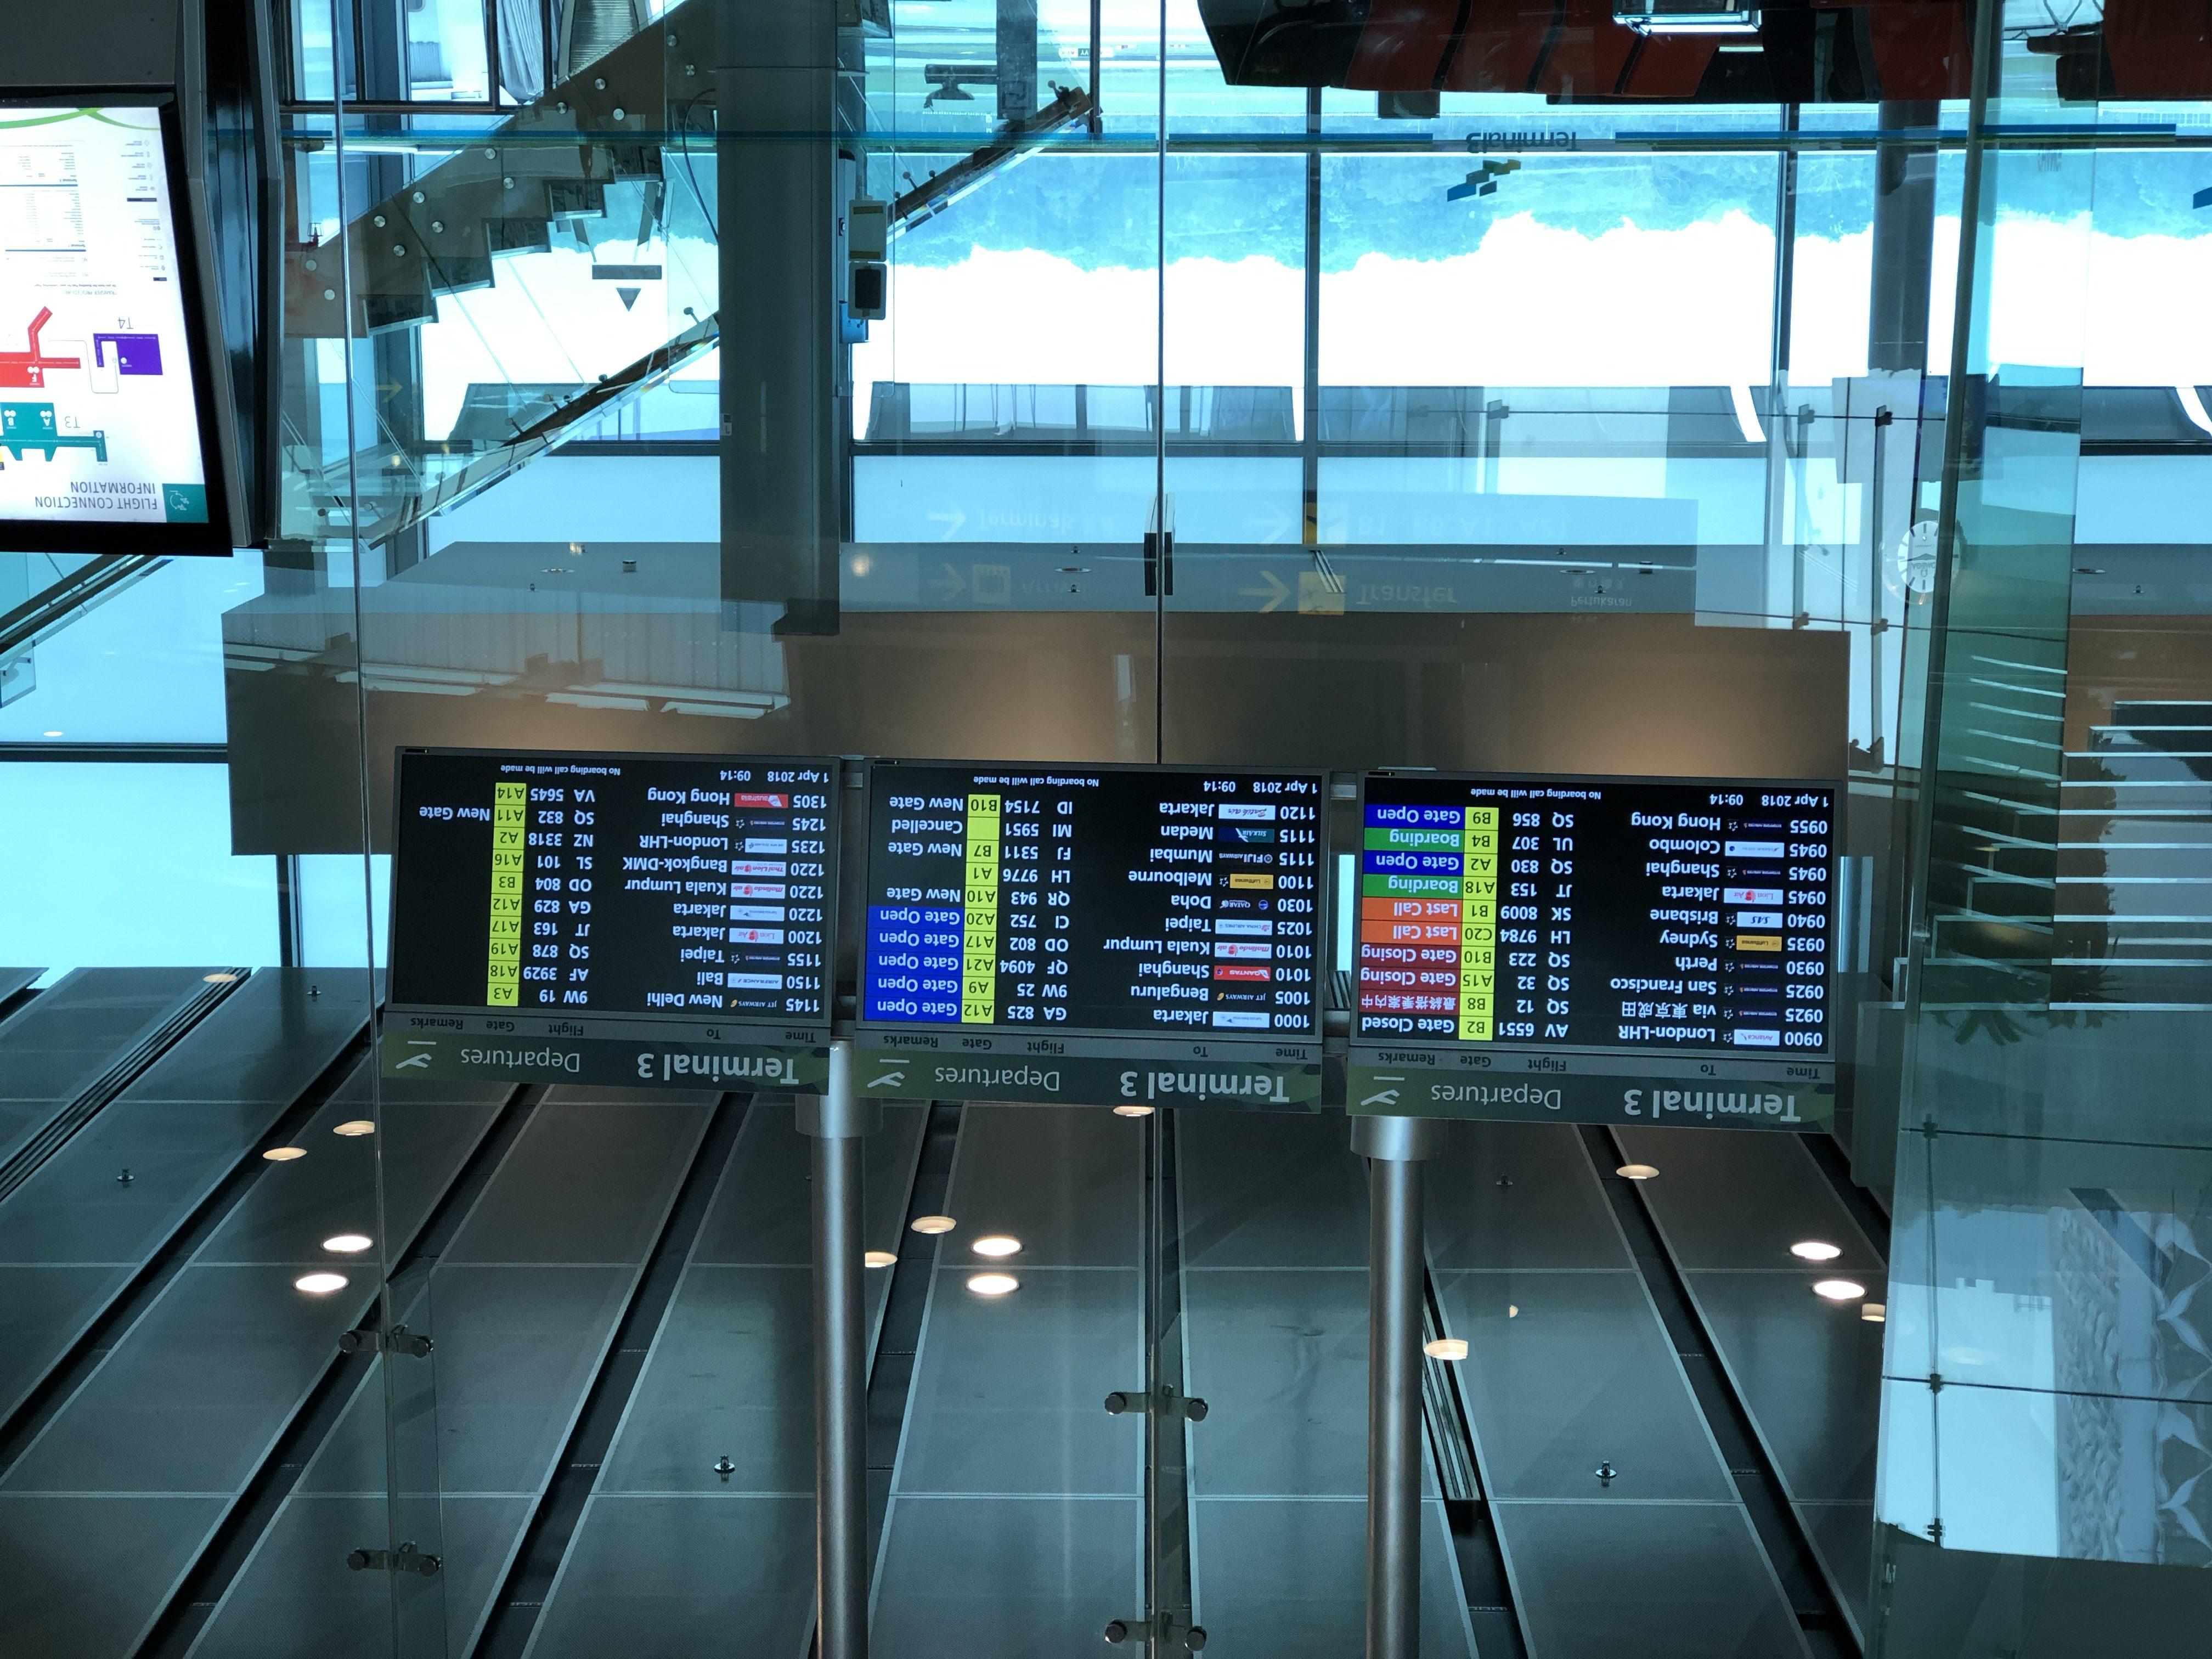 55bb4bb4146 Singapore Changi Airport Customer Reviews